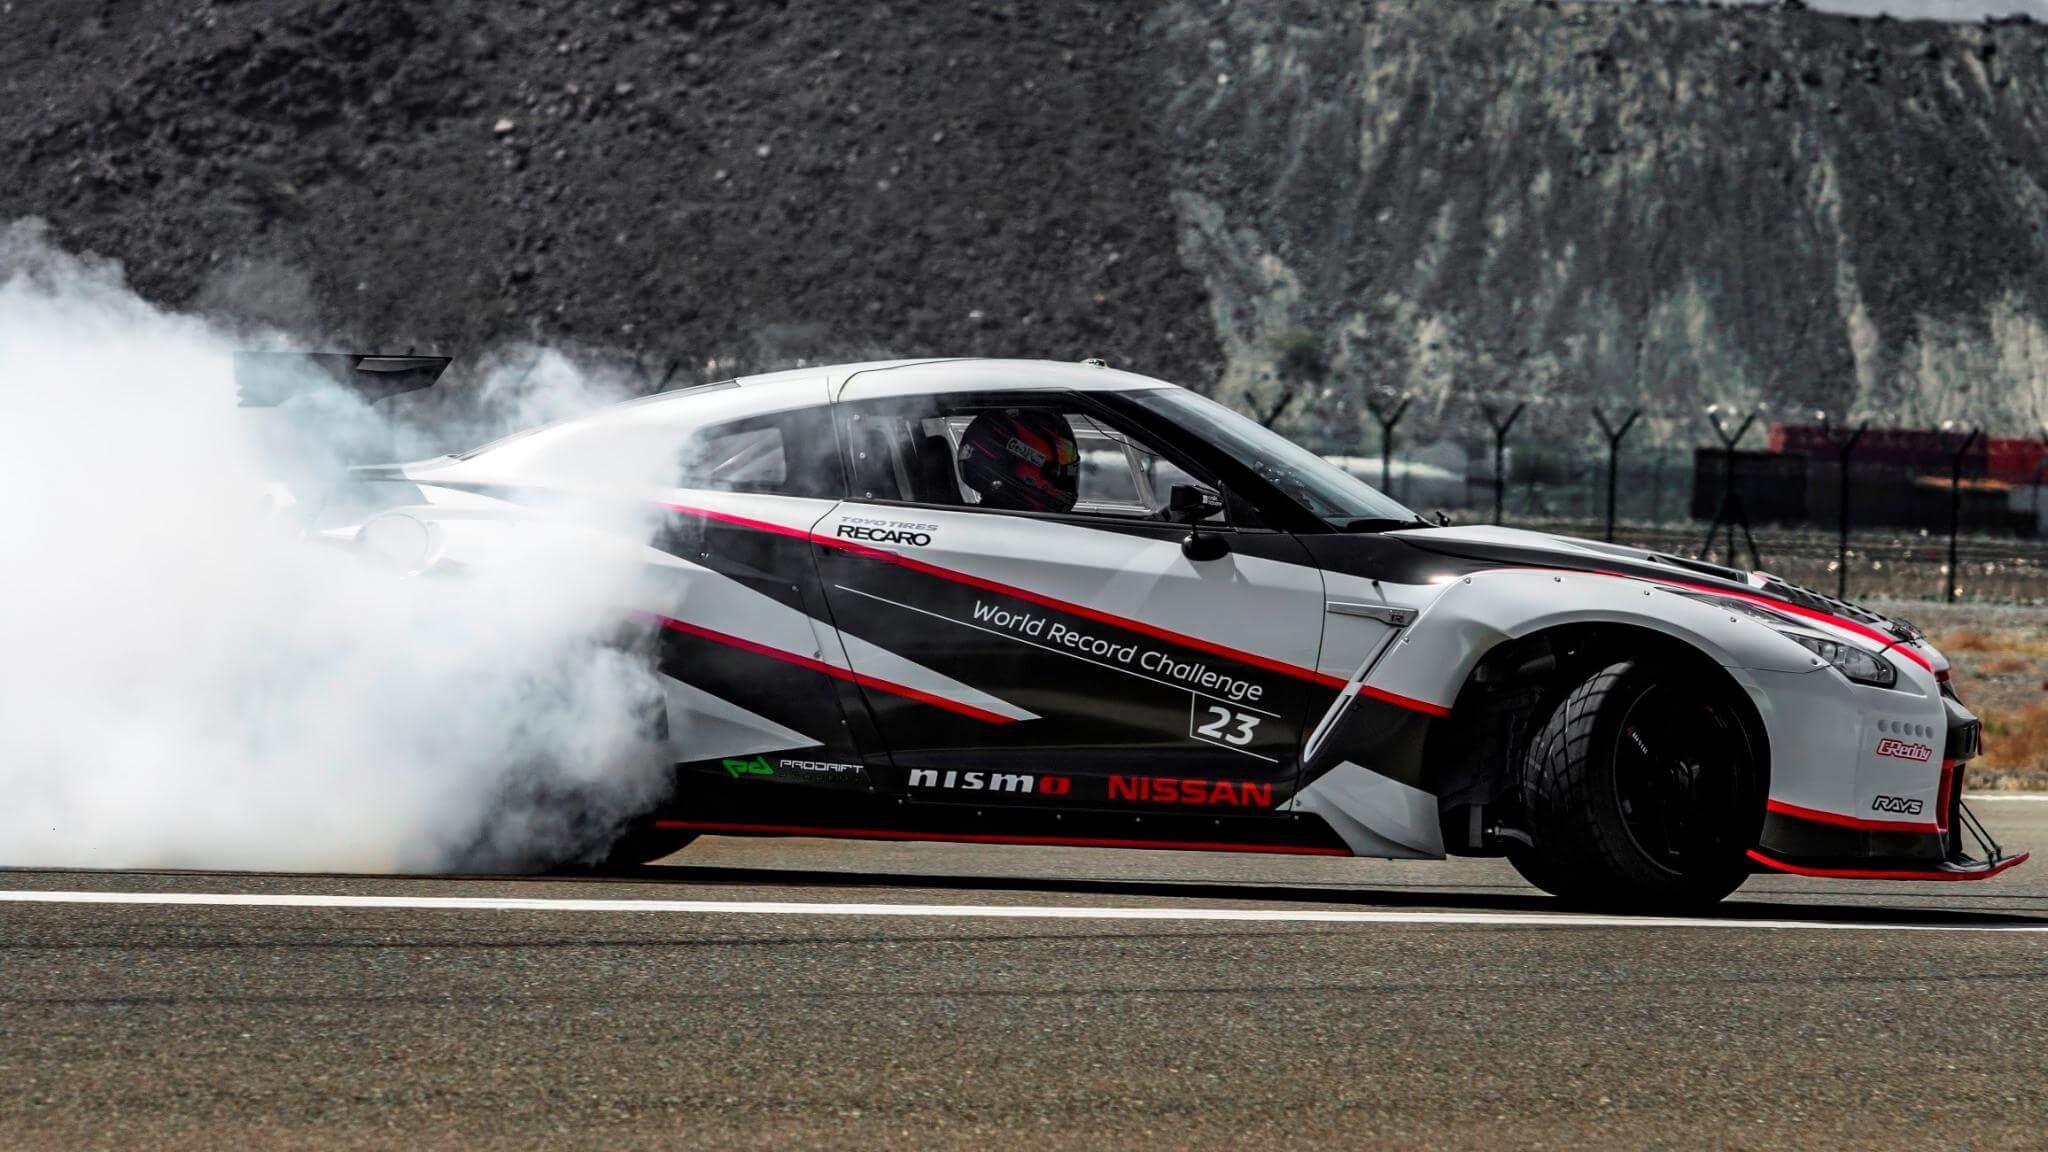 Nissan-GT-R-Nismo-World-Record-Drift-wallpaper-wp5801004